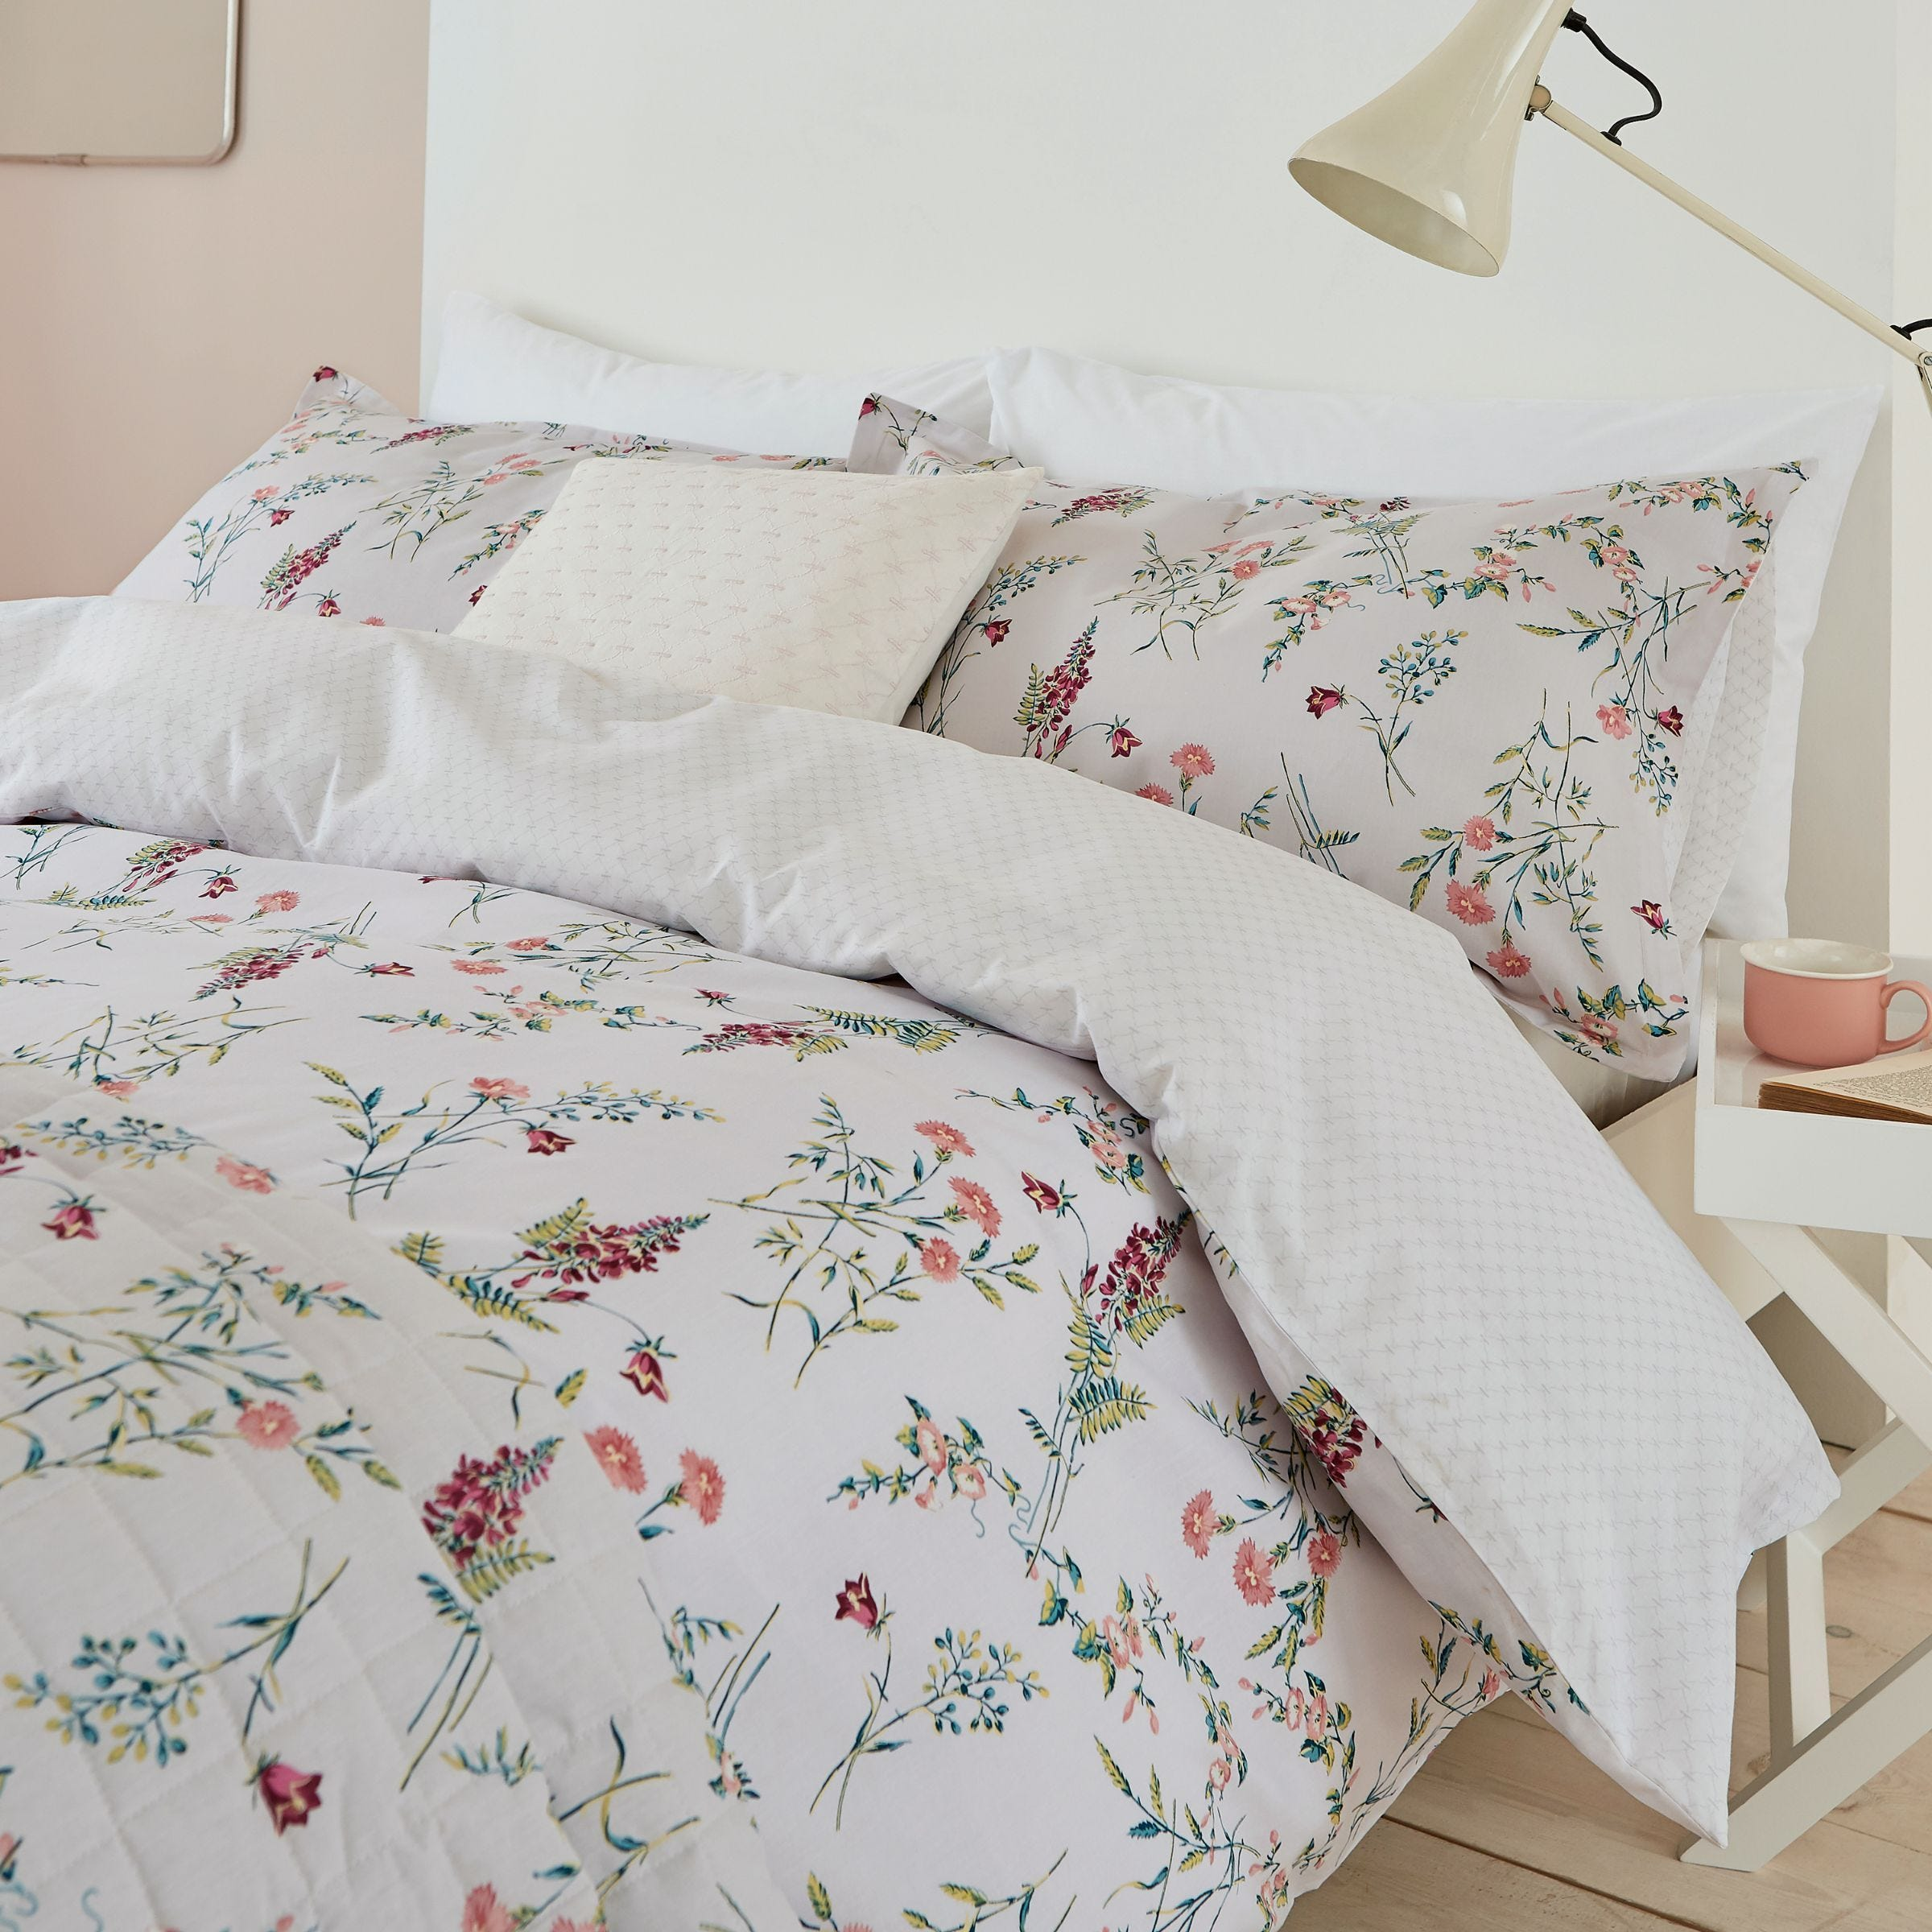 Sanderson Alnwick Gardens Single Duvet Cover Set, Orchid